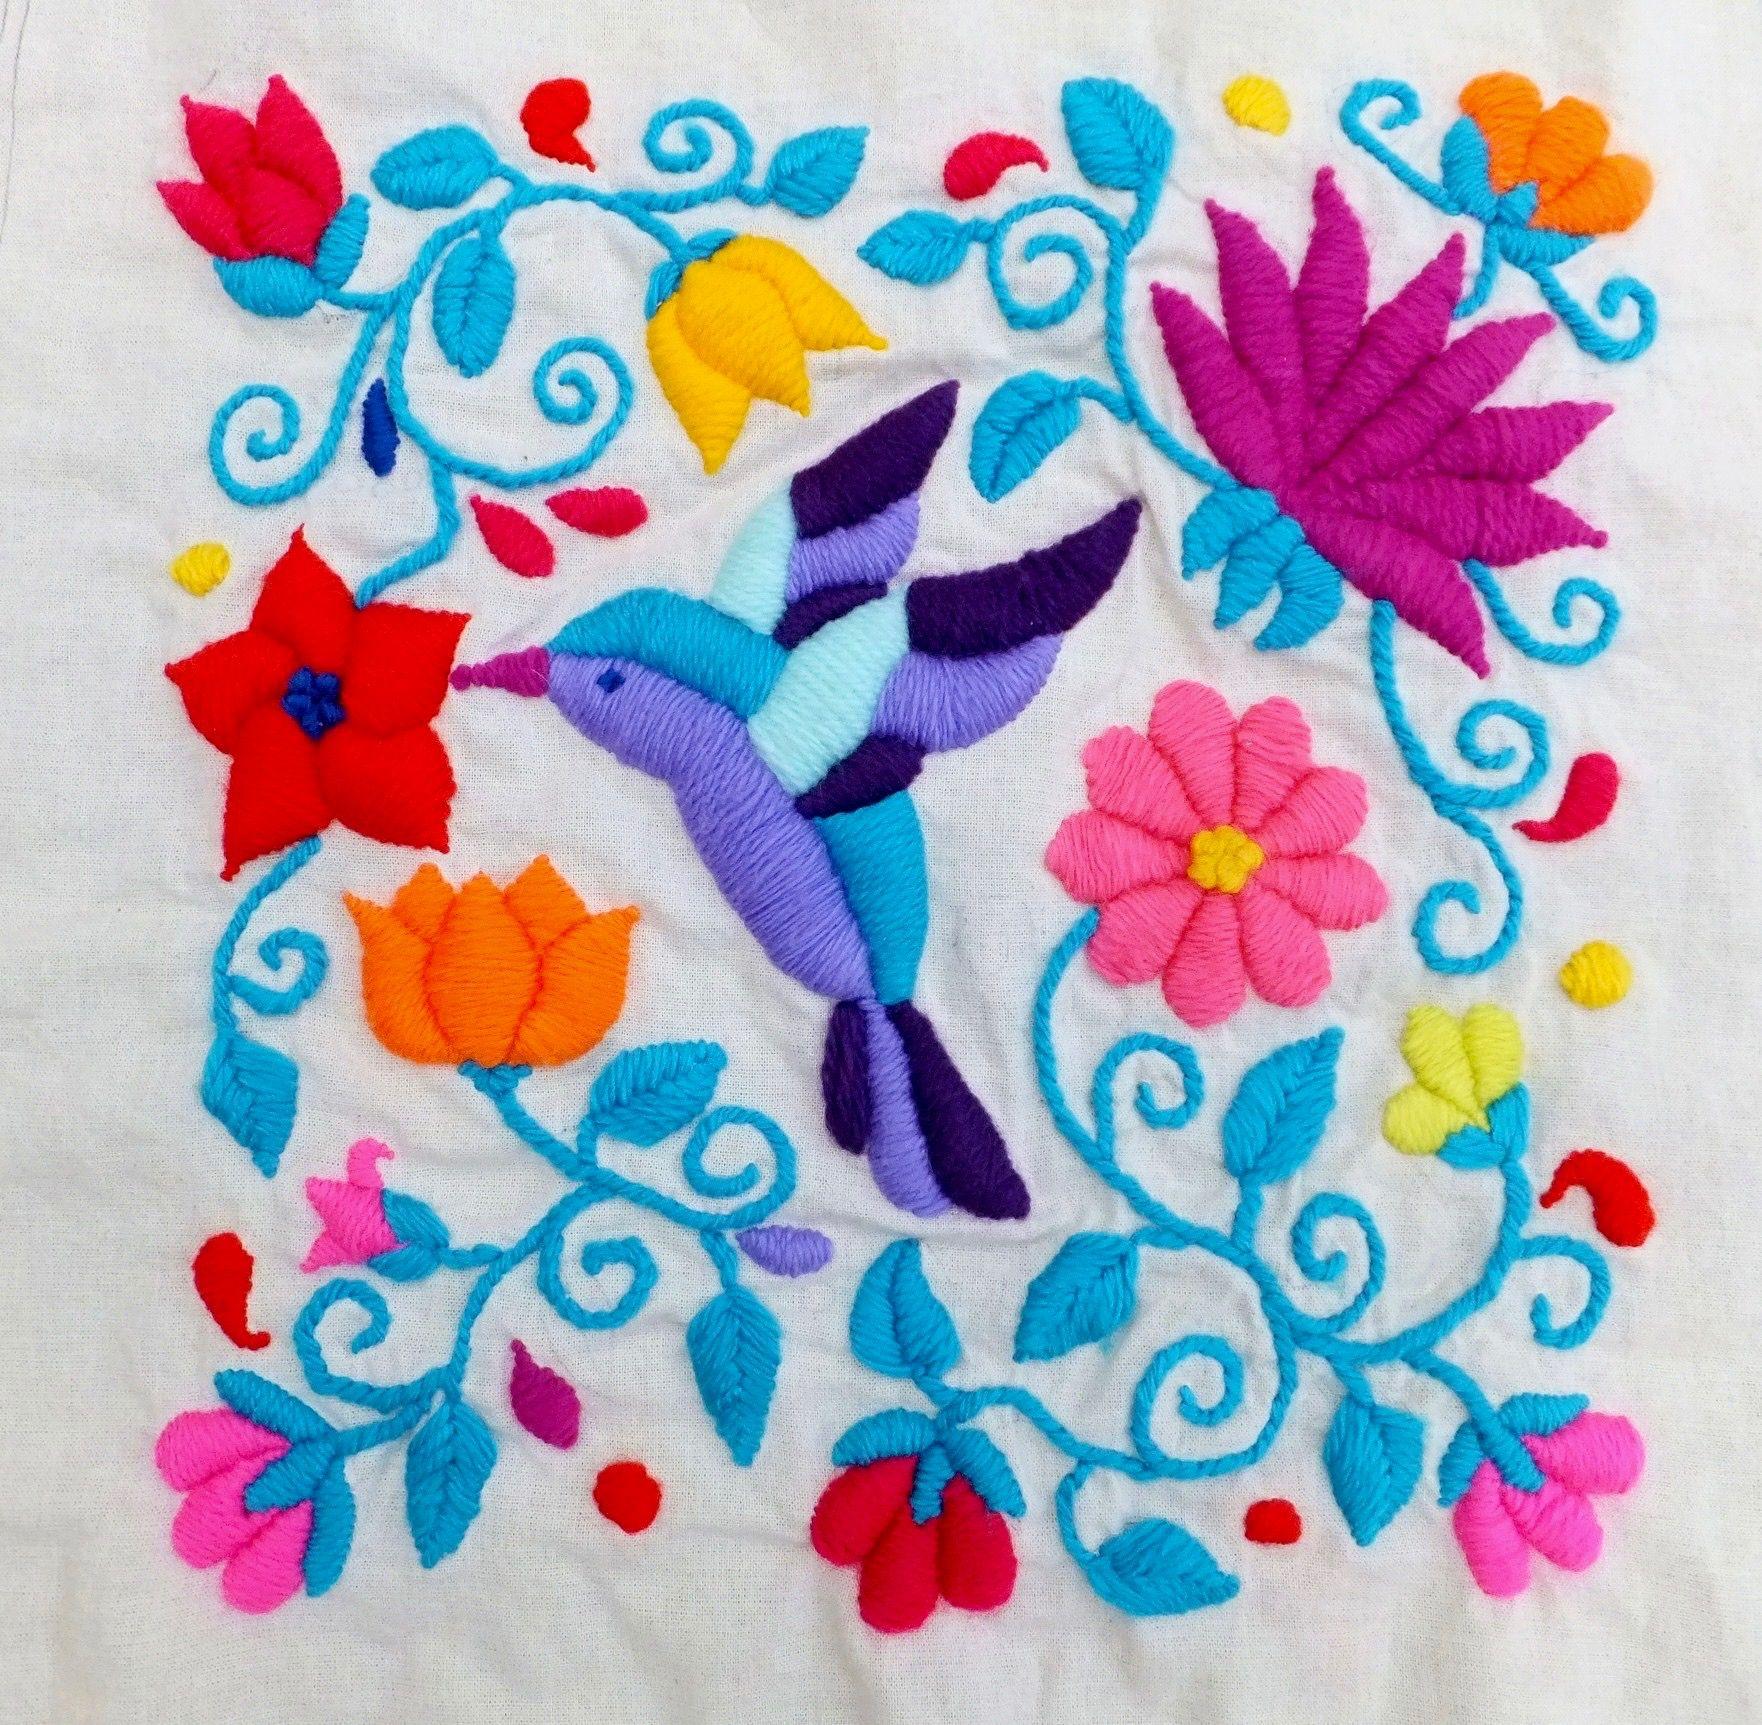 Bordado Mejicano . Mexican Embroidery By Lilibeth Harris